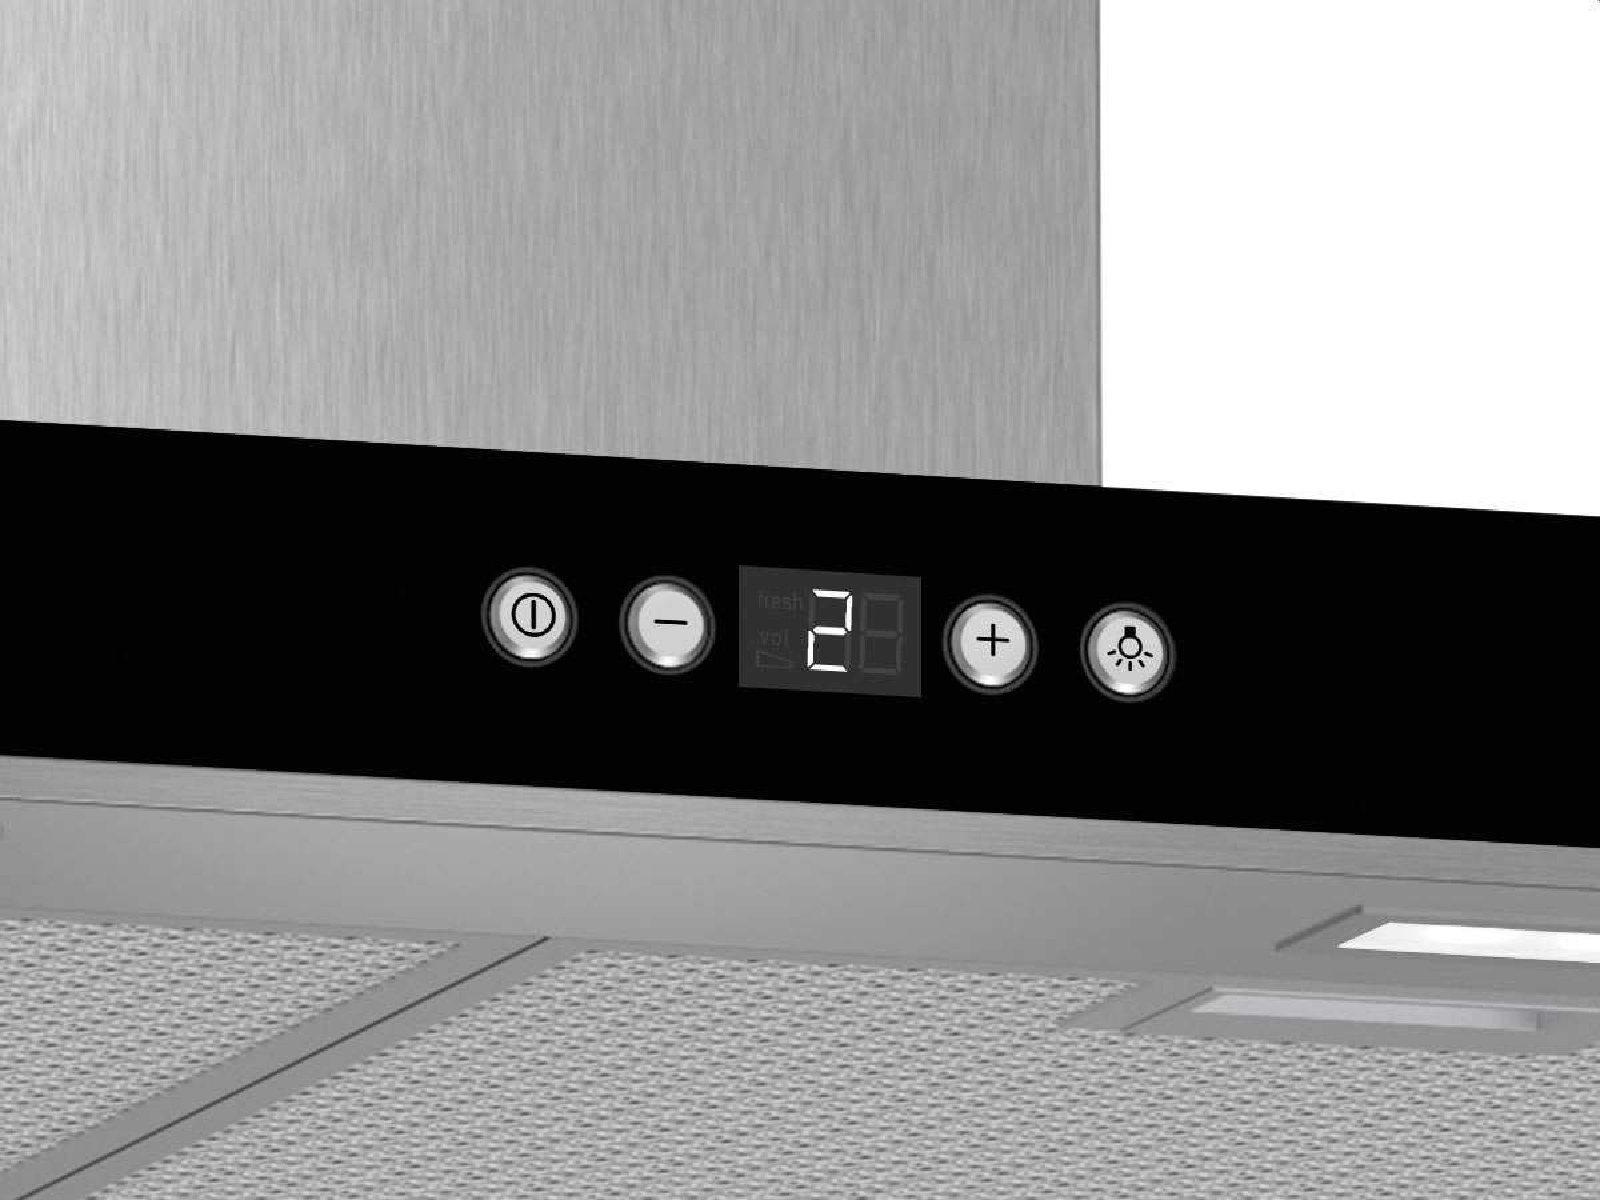 neff dmh 7652 n wandhaube dunstabzugshaube dunstesse k che wandabzug dunstabzug. Black Bedroom Furniture Sets. Home Design Ideas